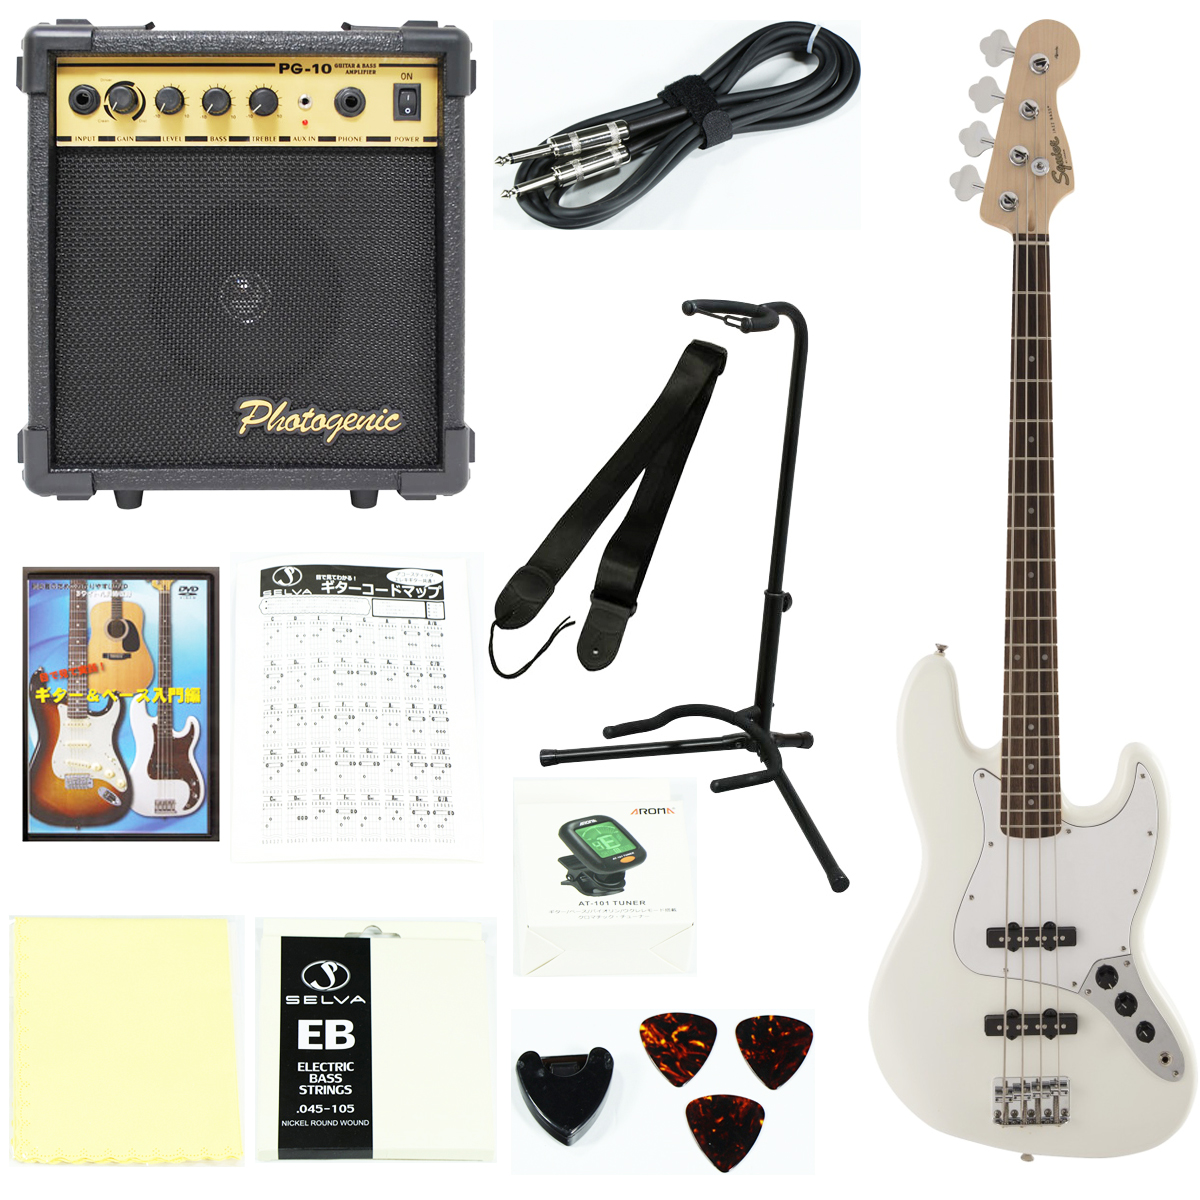 Squier by Fender / Affinity Jazz Bass Laurel Fingerboard Olympic White【エレキベース入門セット】初心者 入門セット 初心者セット